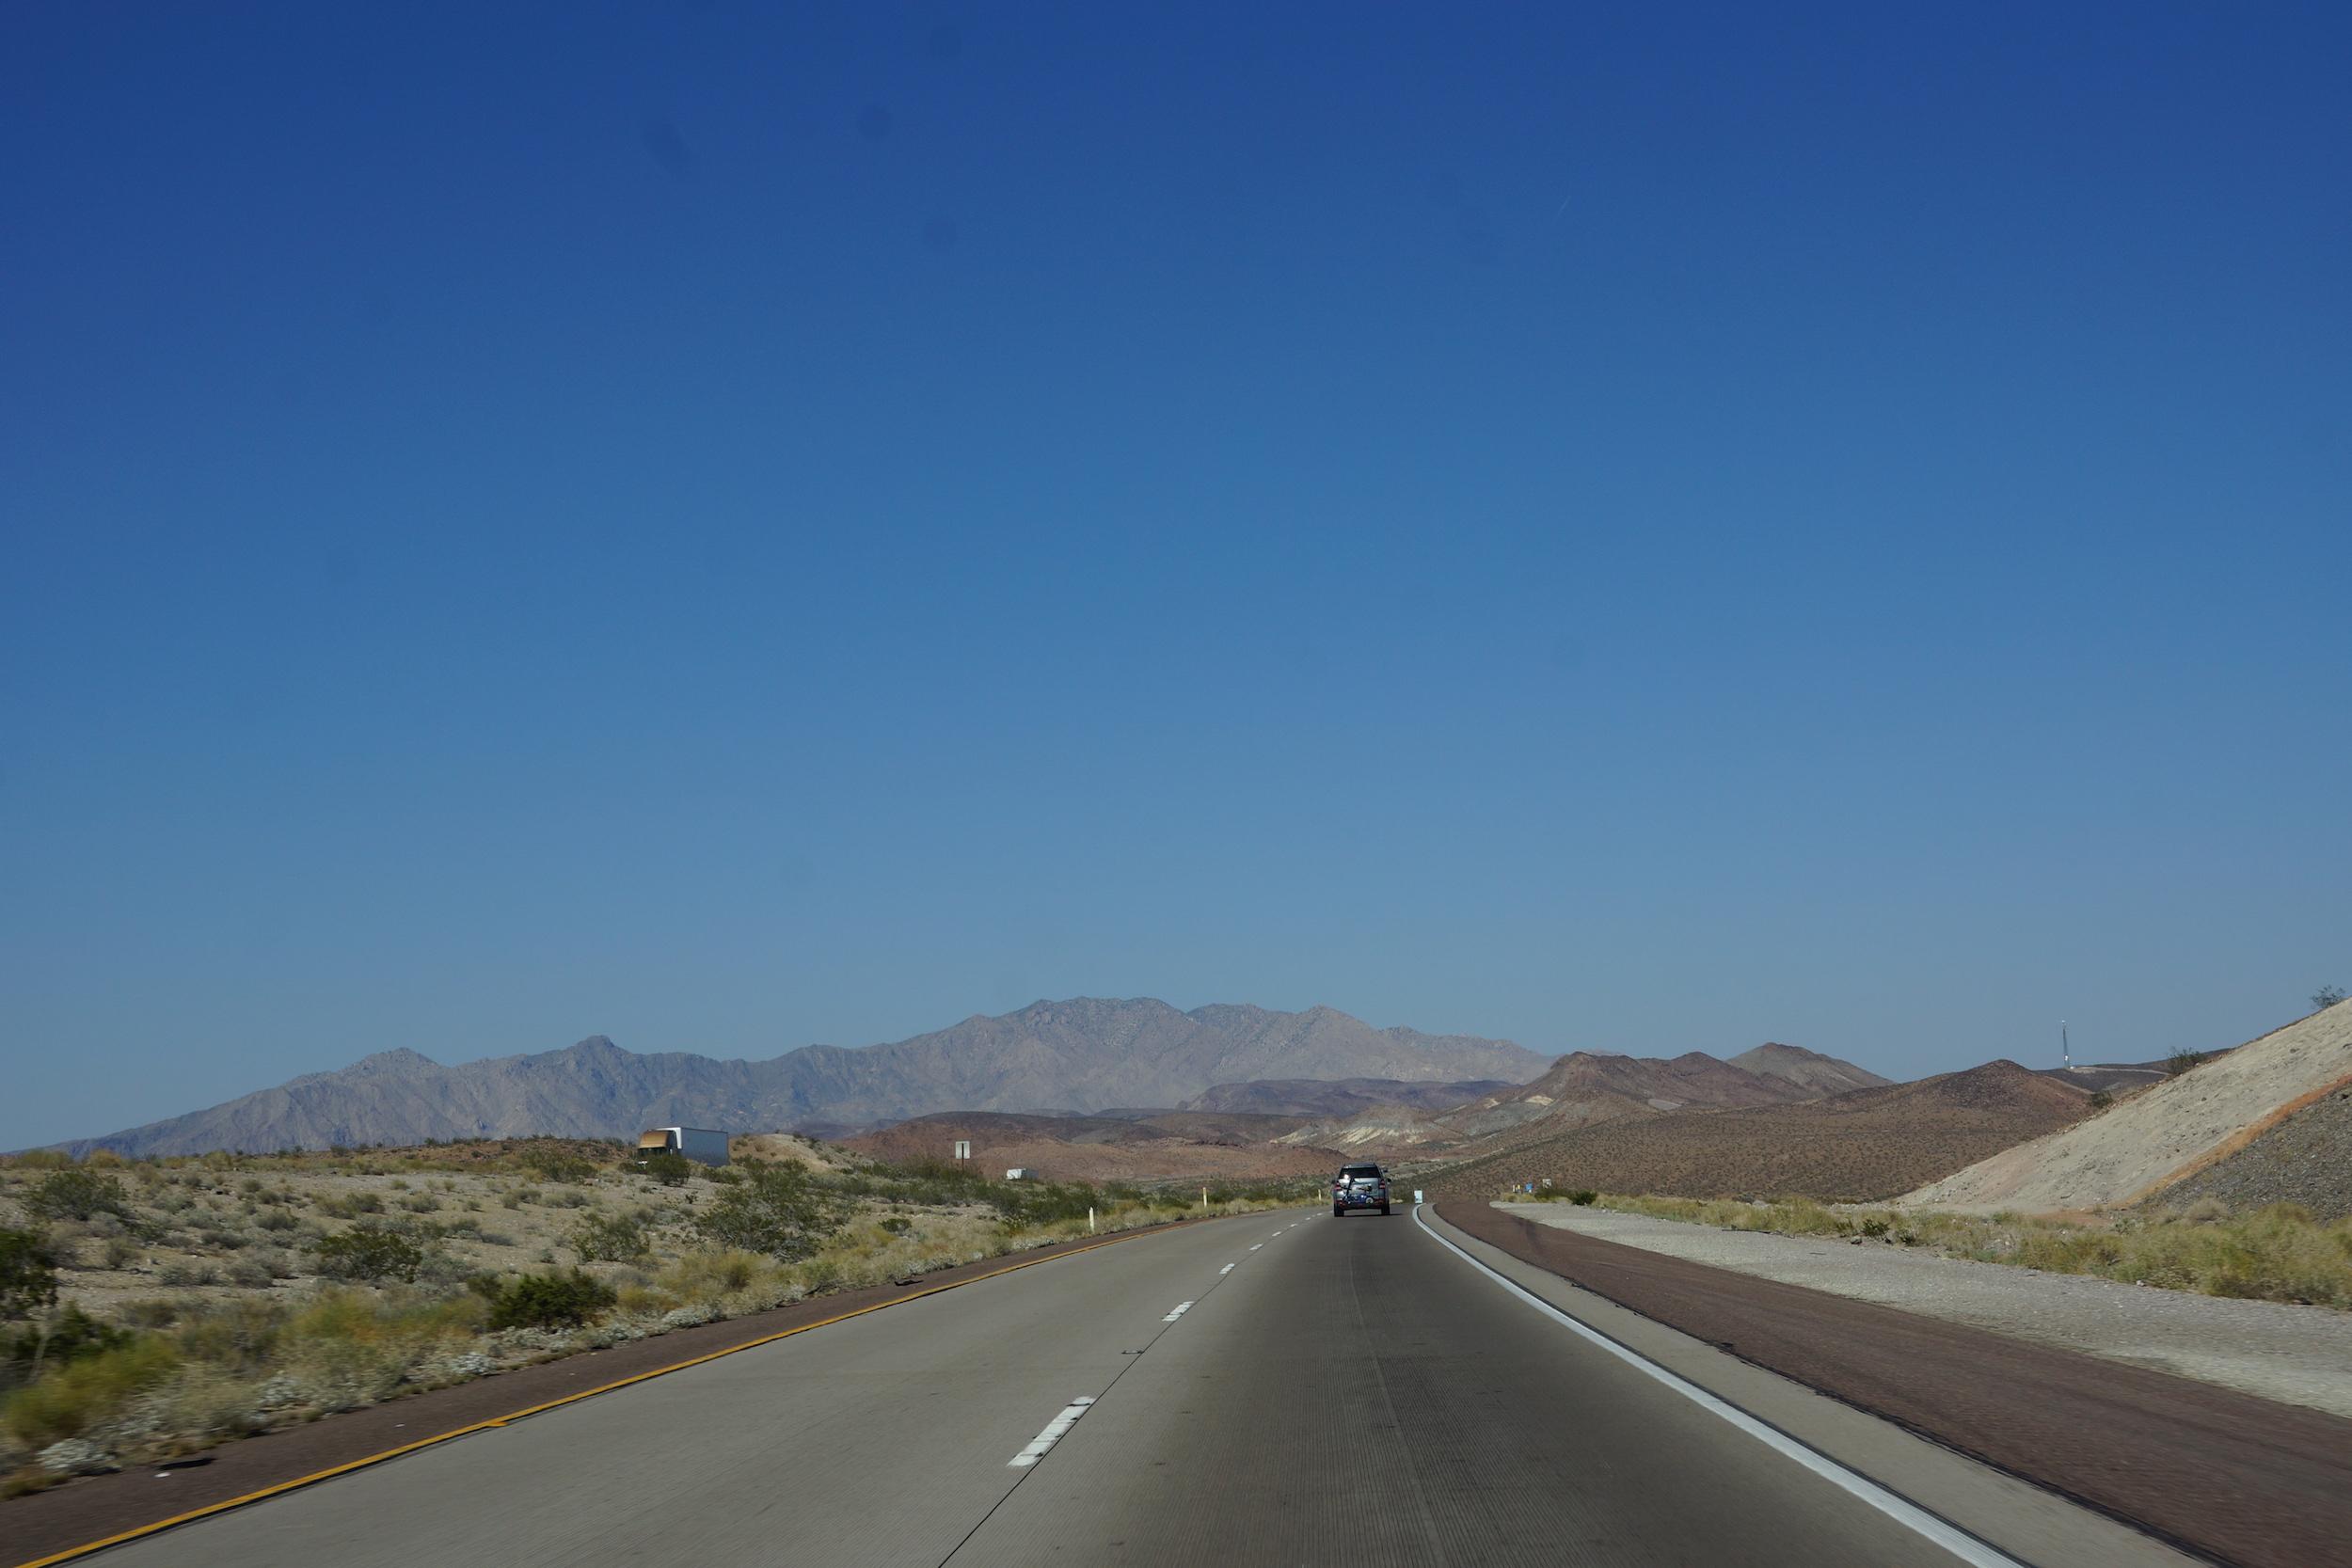 road-trip-usa-autoroute-vers-needles